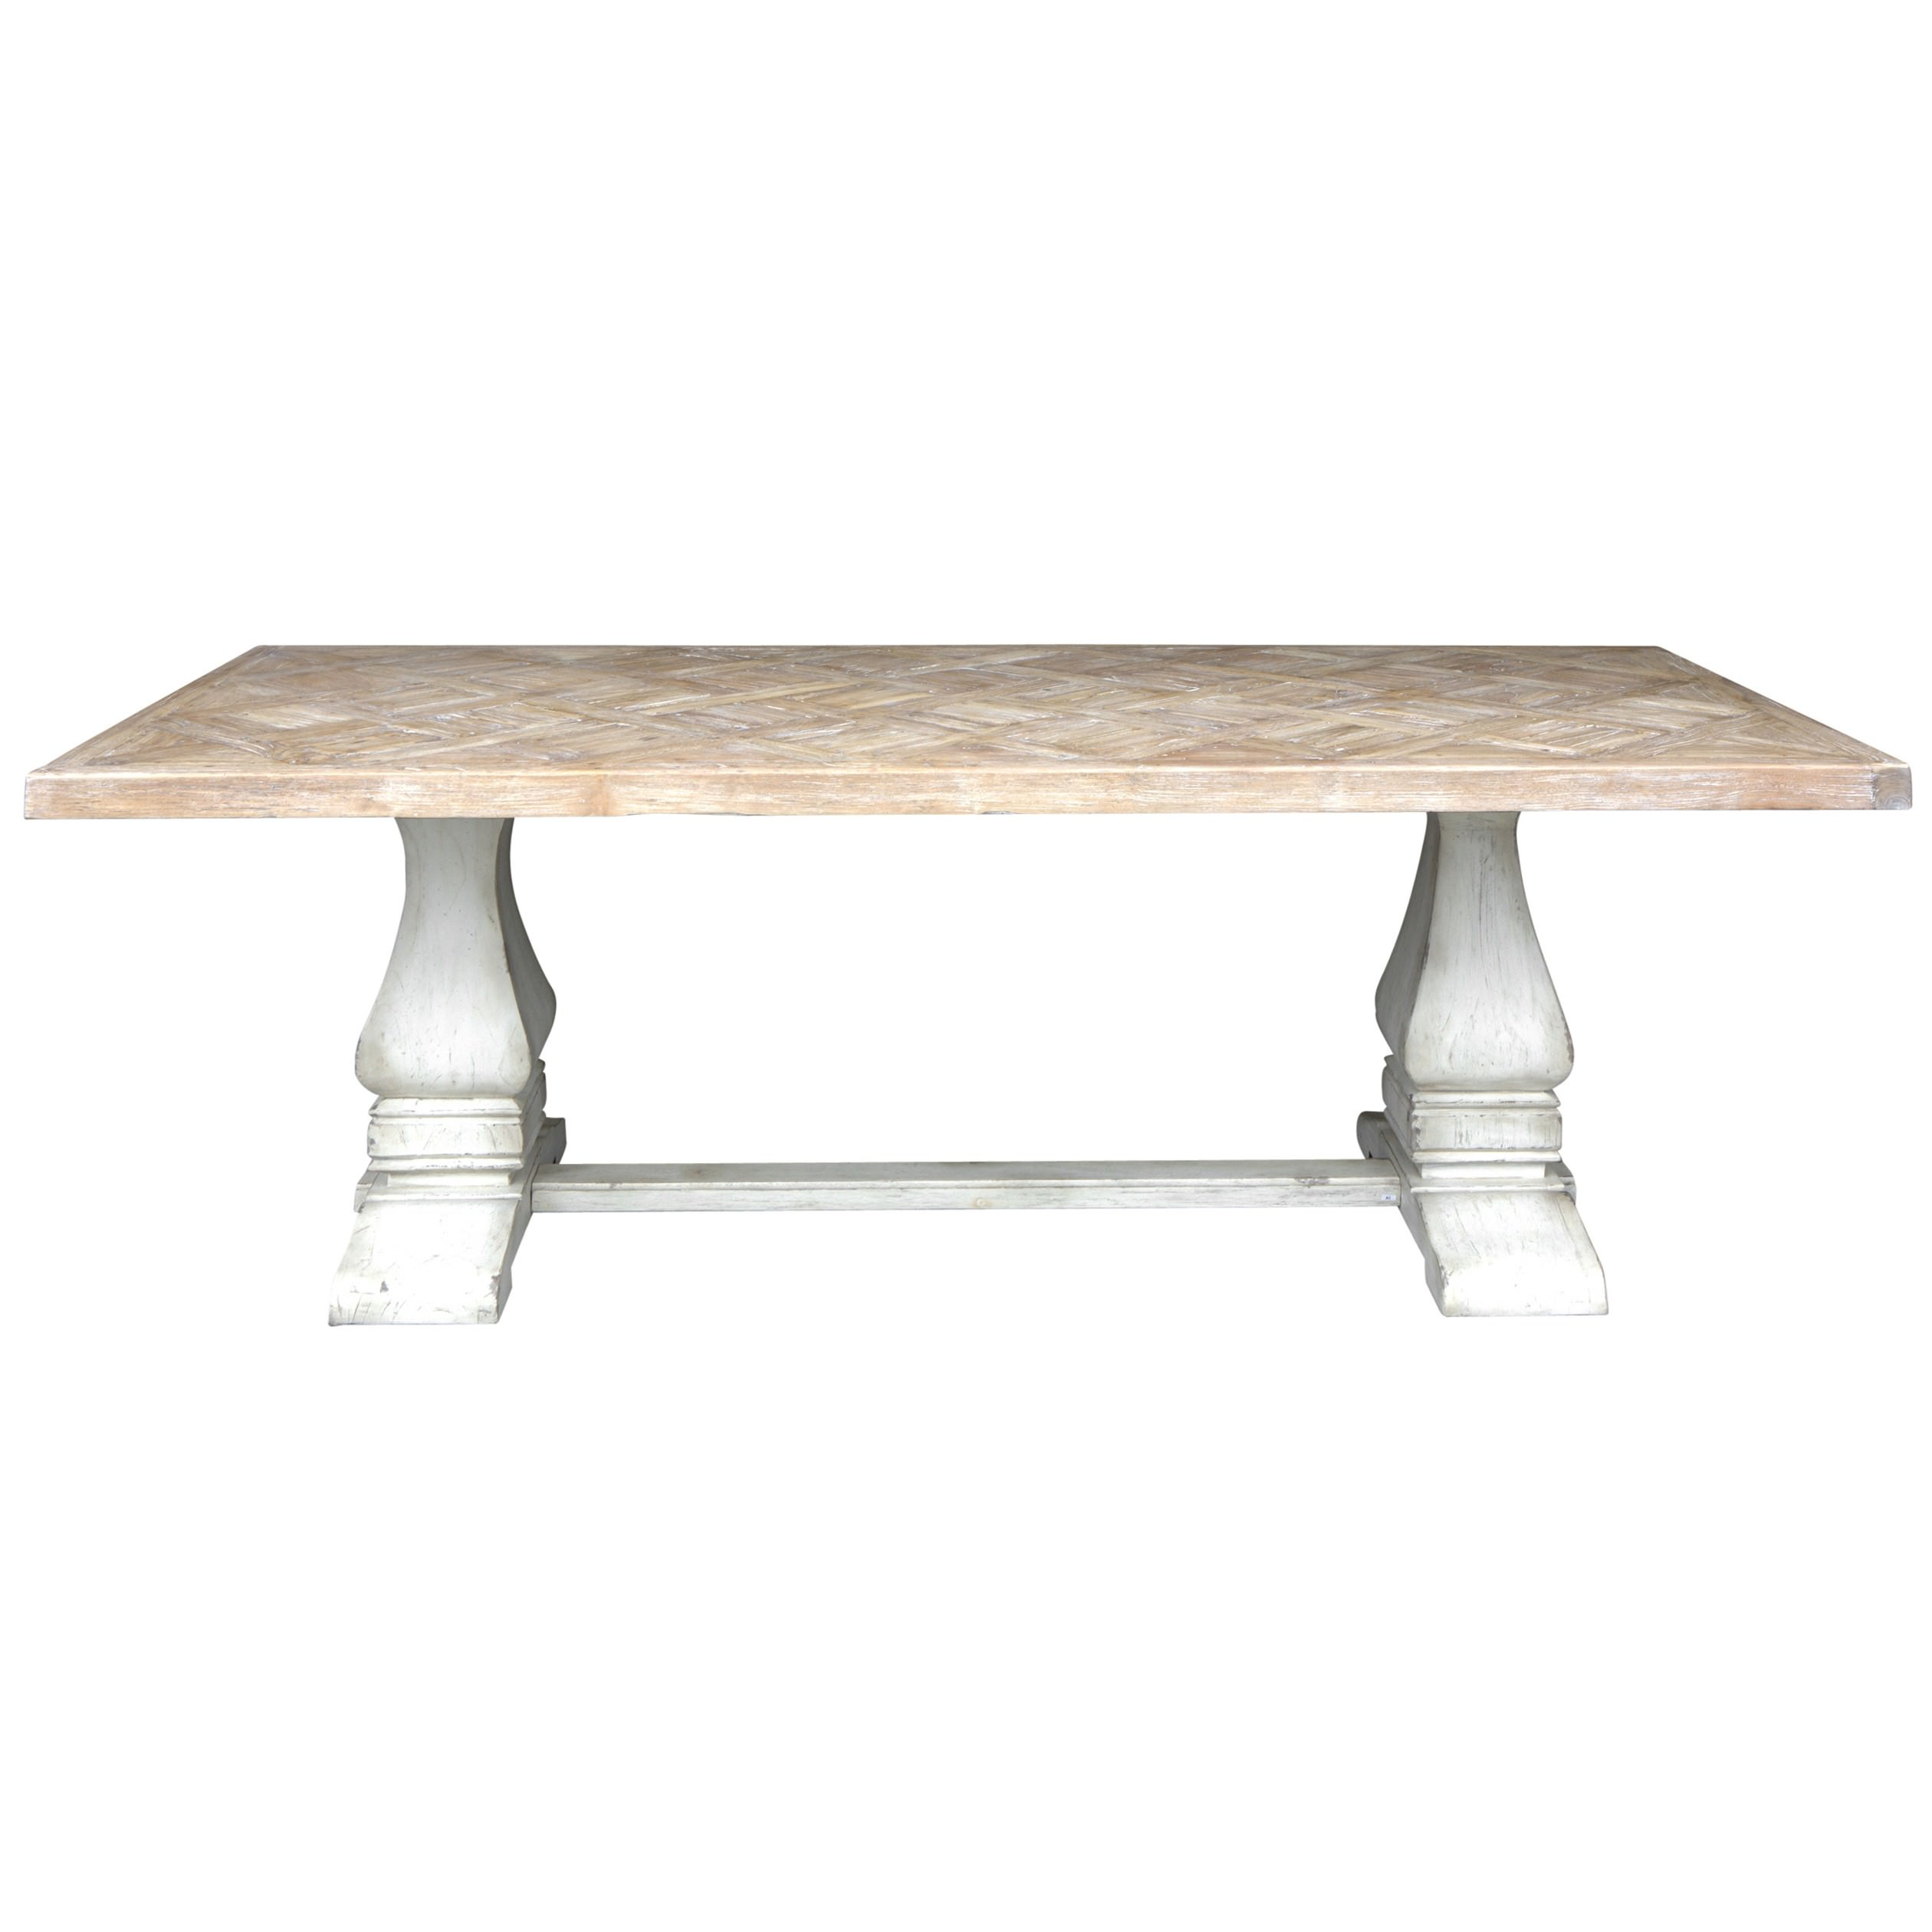 Normandy Teak & Mindi Wood Trestle Dining Table, 220cm